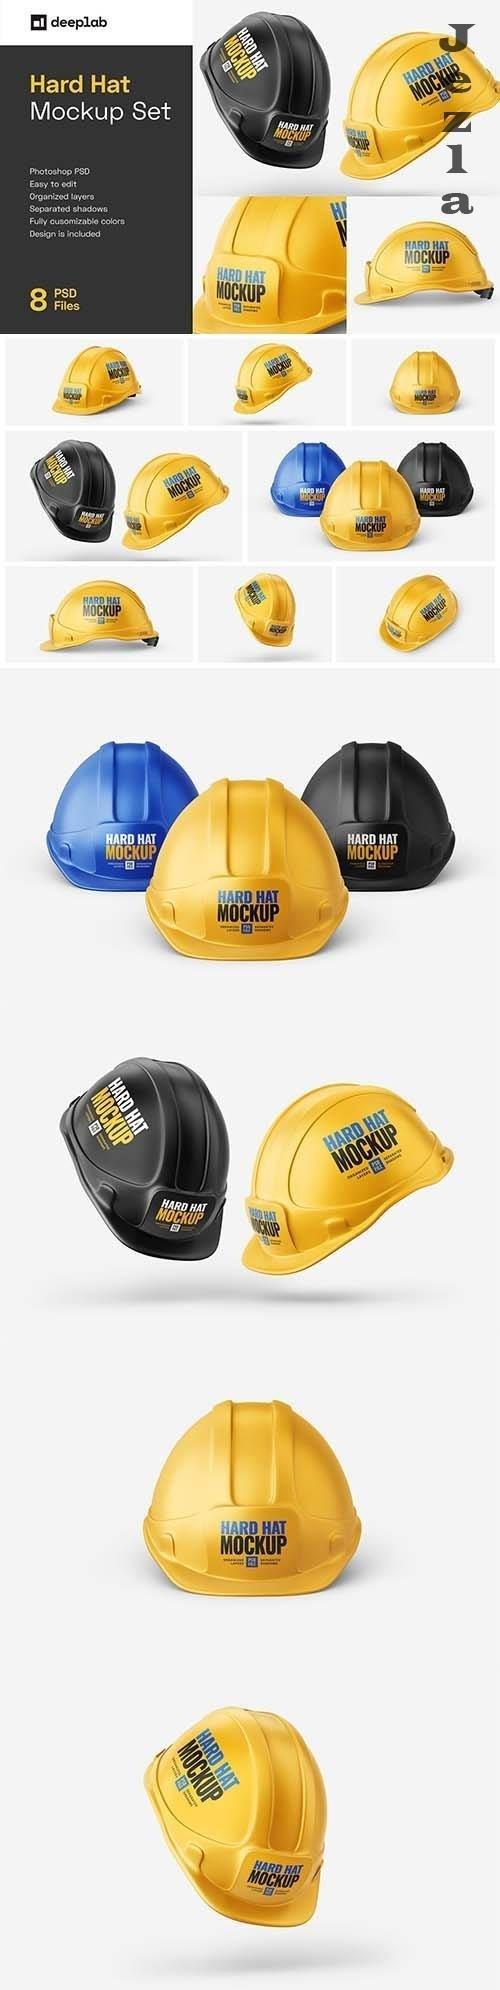 CreativeMarket - Construction Hard Hat Mockup Set 5997098